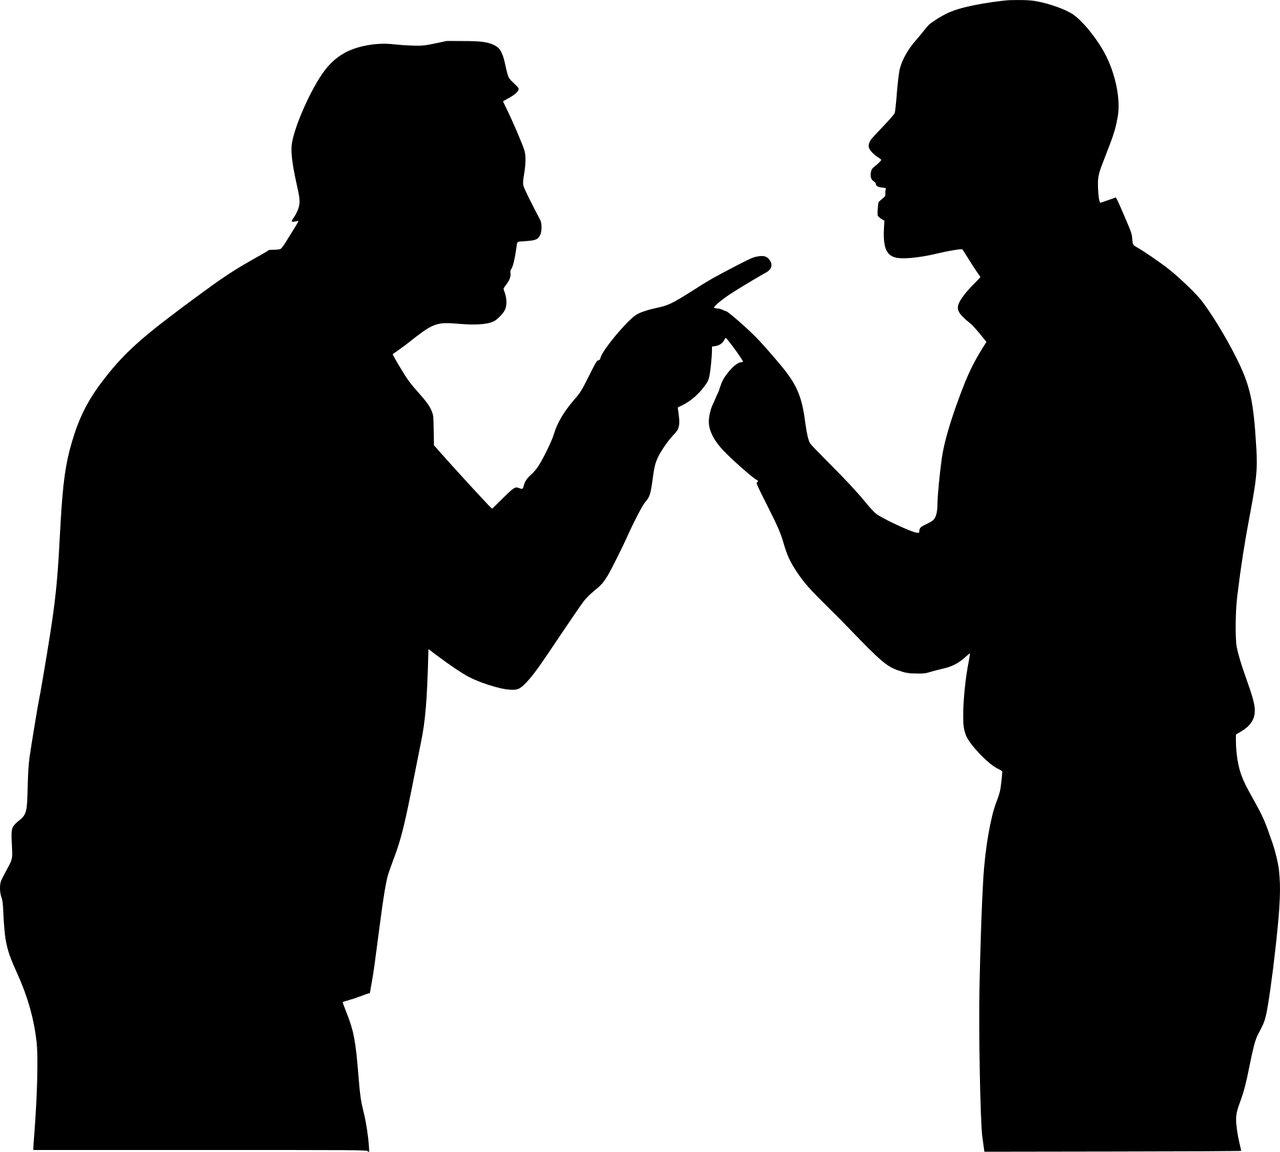 orden_sistemico_parentificacion